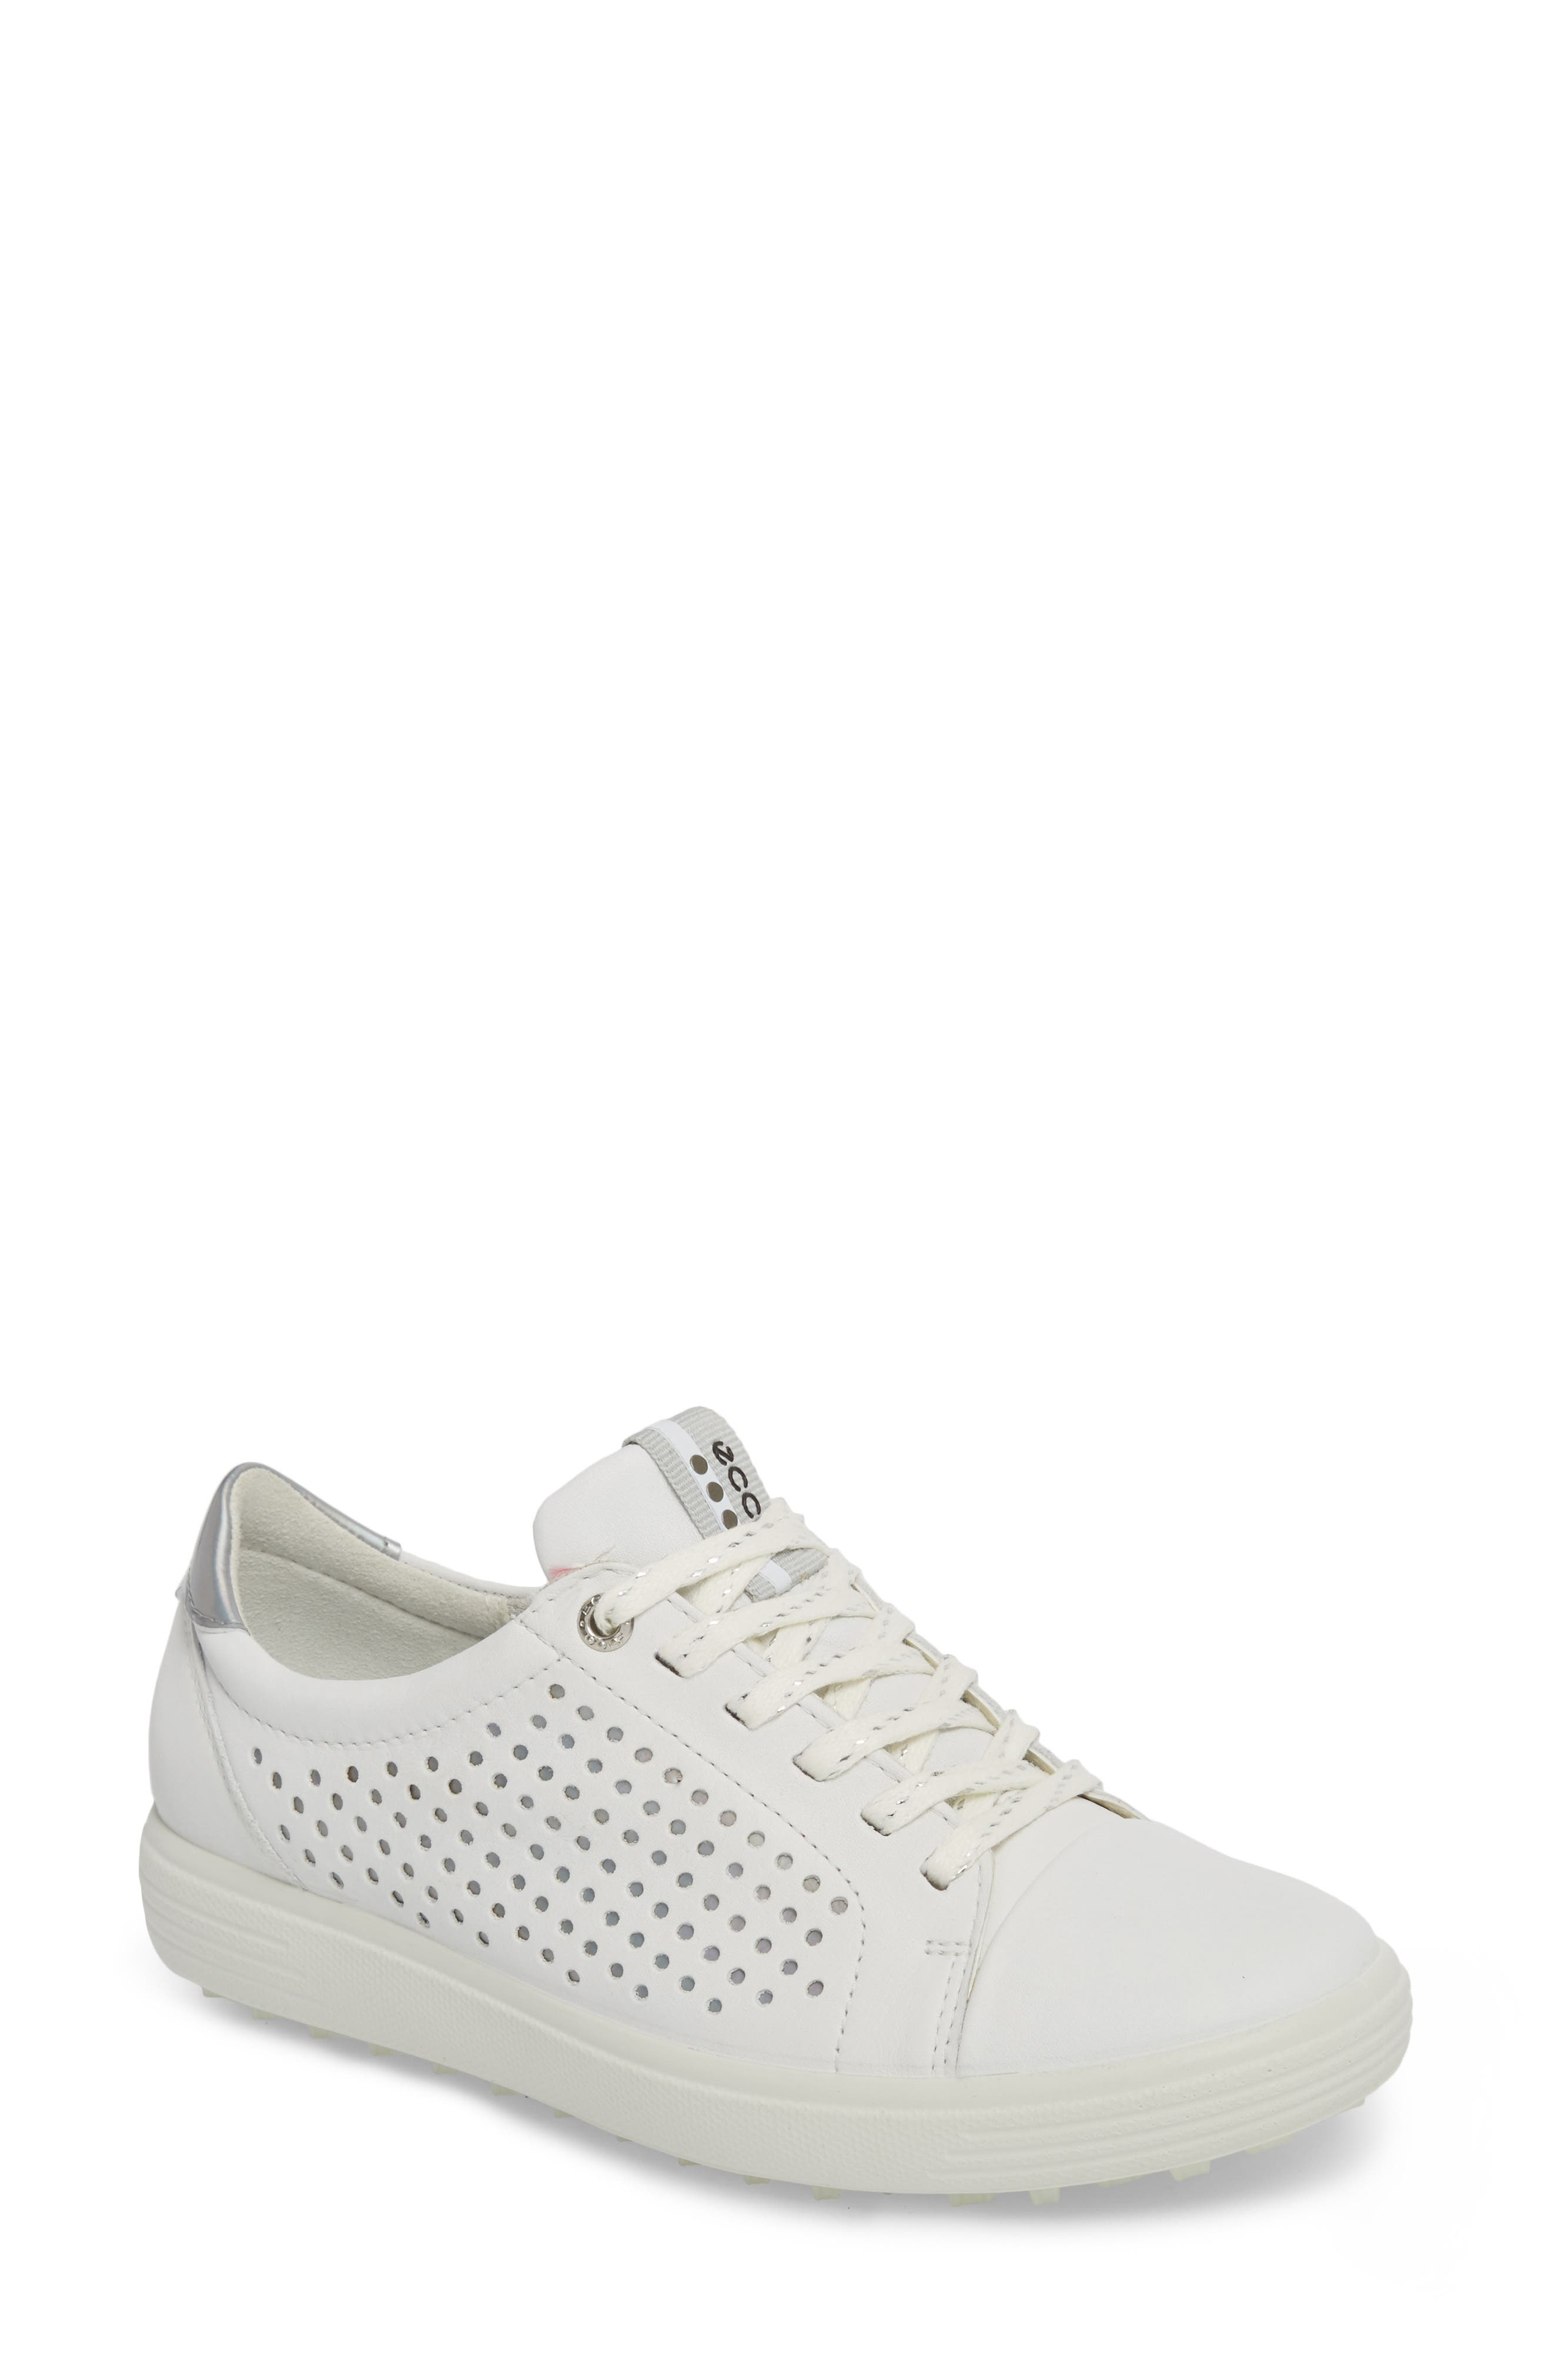 ecco shoes for women